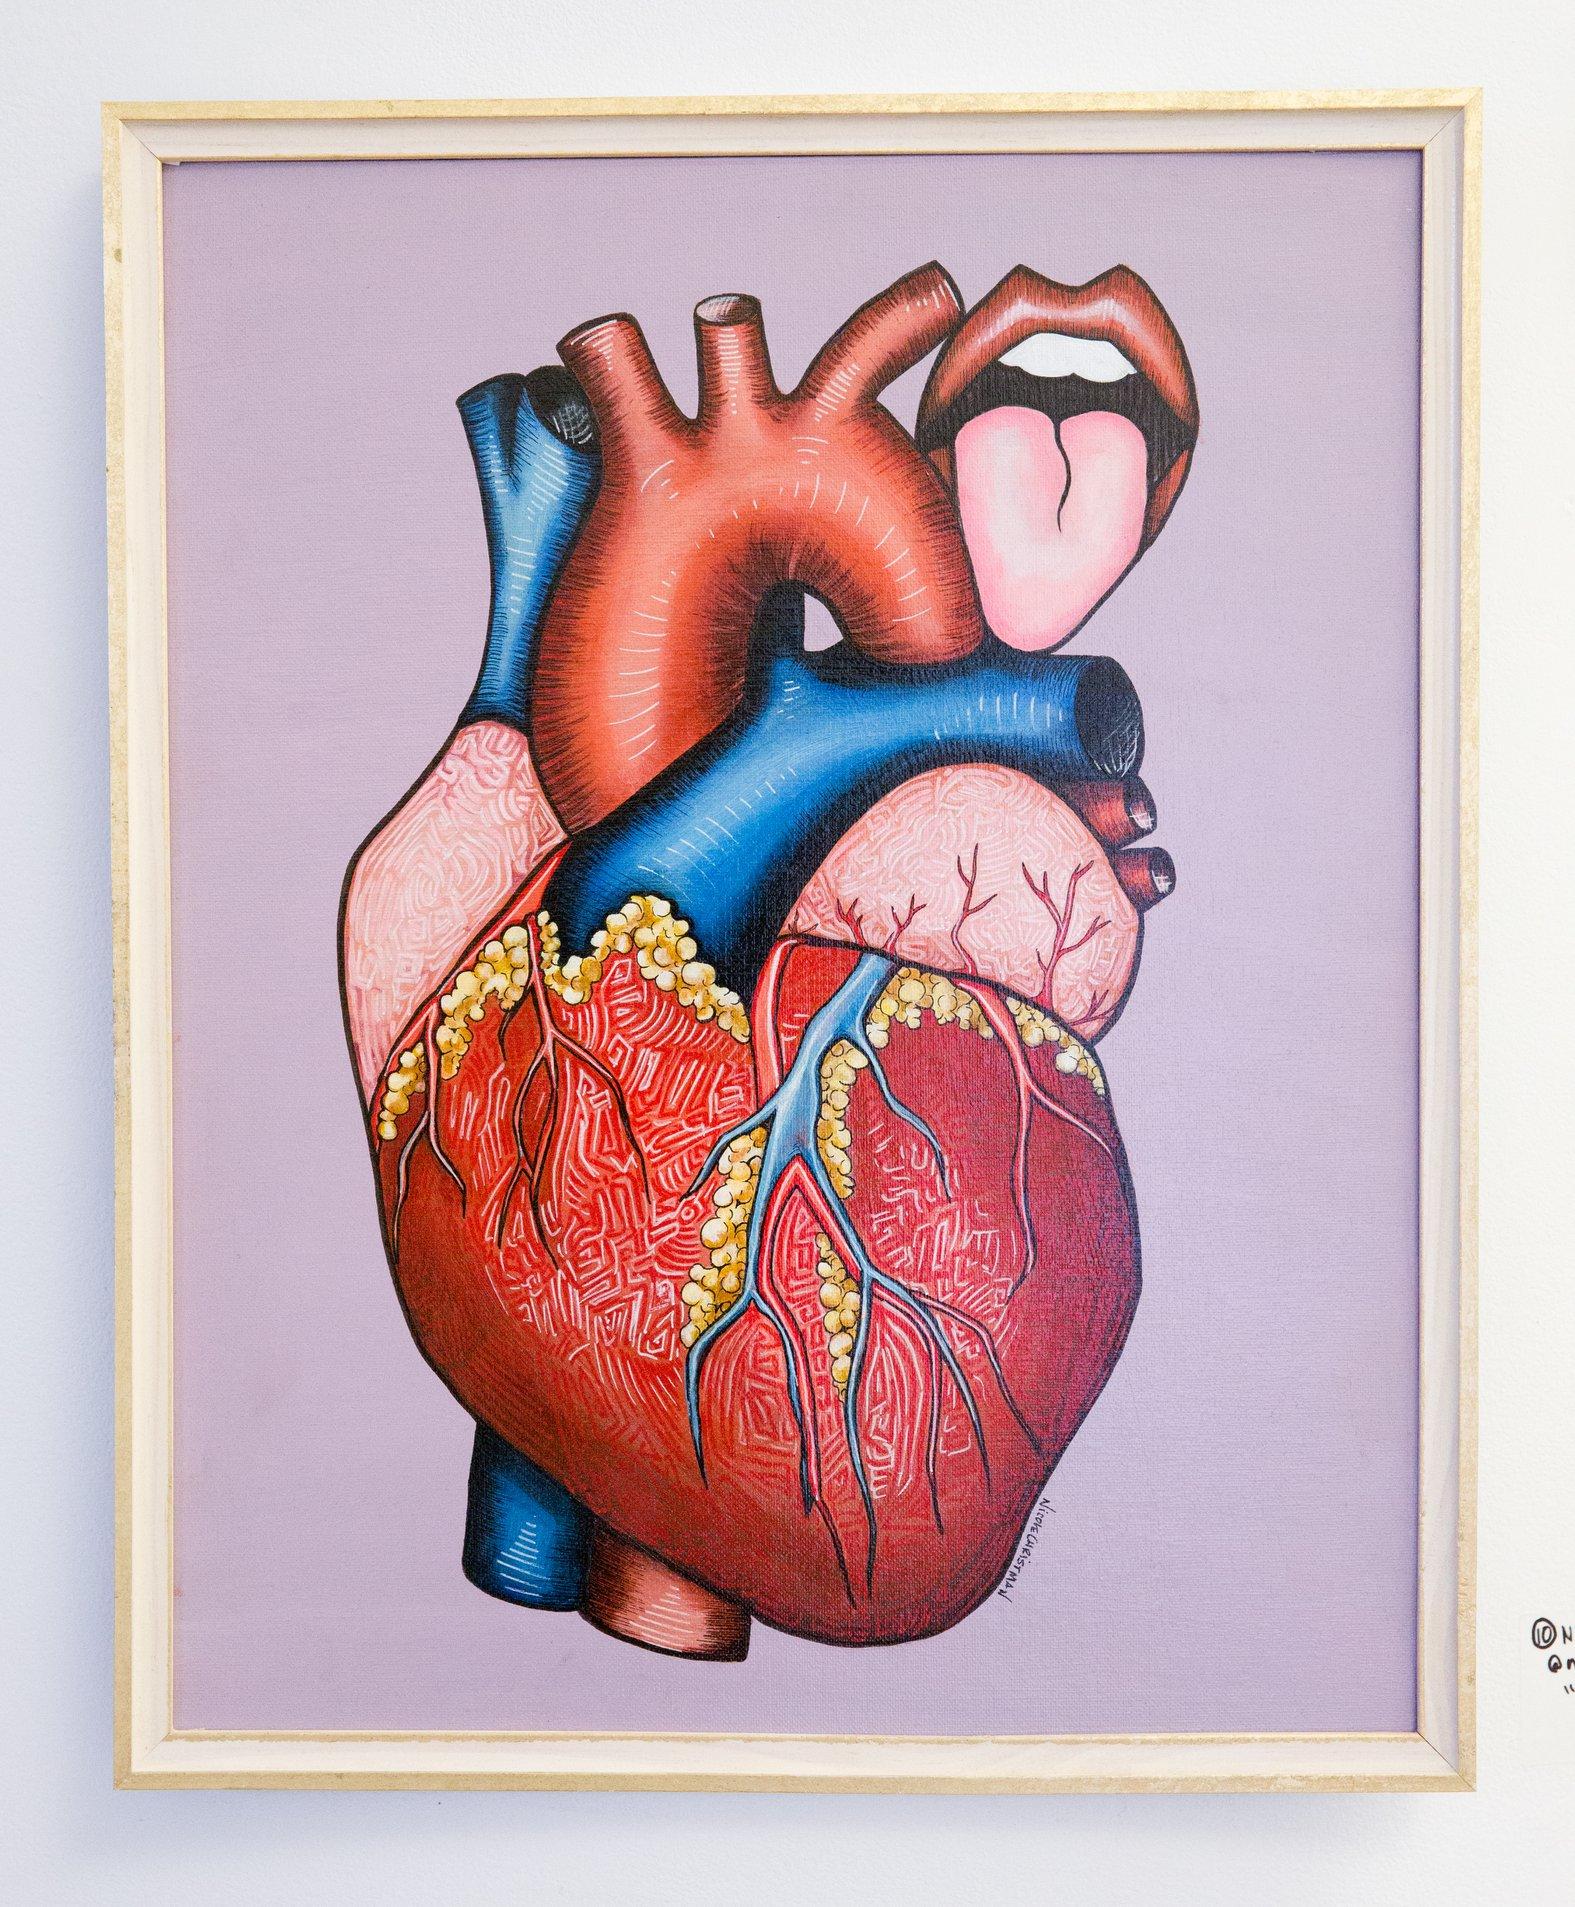 "Nicole Christman - ""Eat my heart out"" For Sale: $200 Insta: @nicolechristmanart"